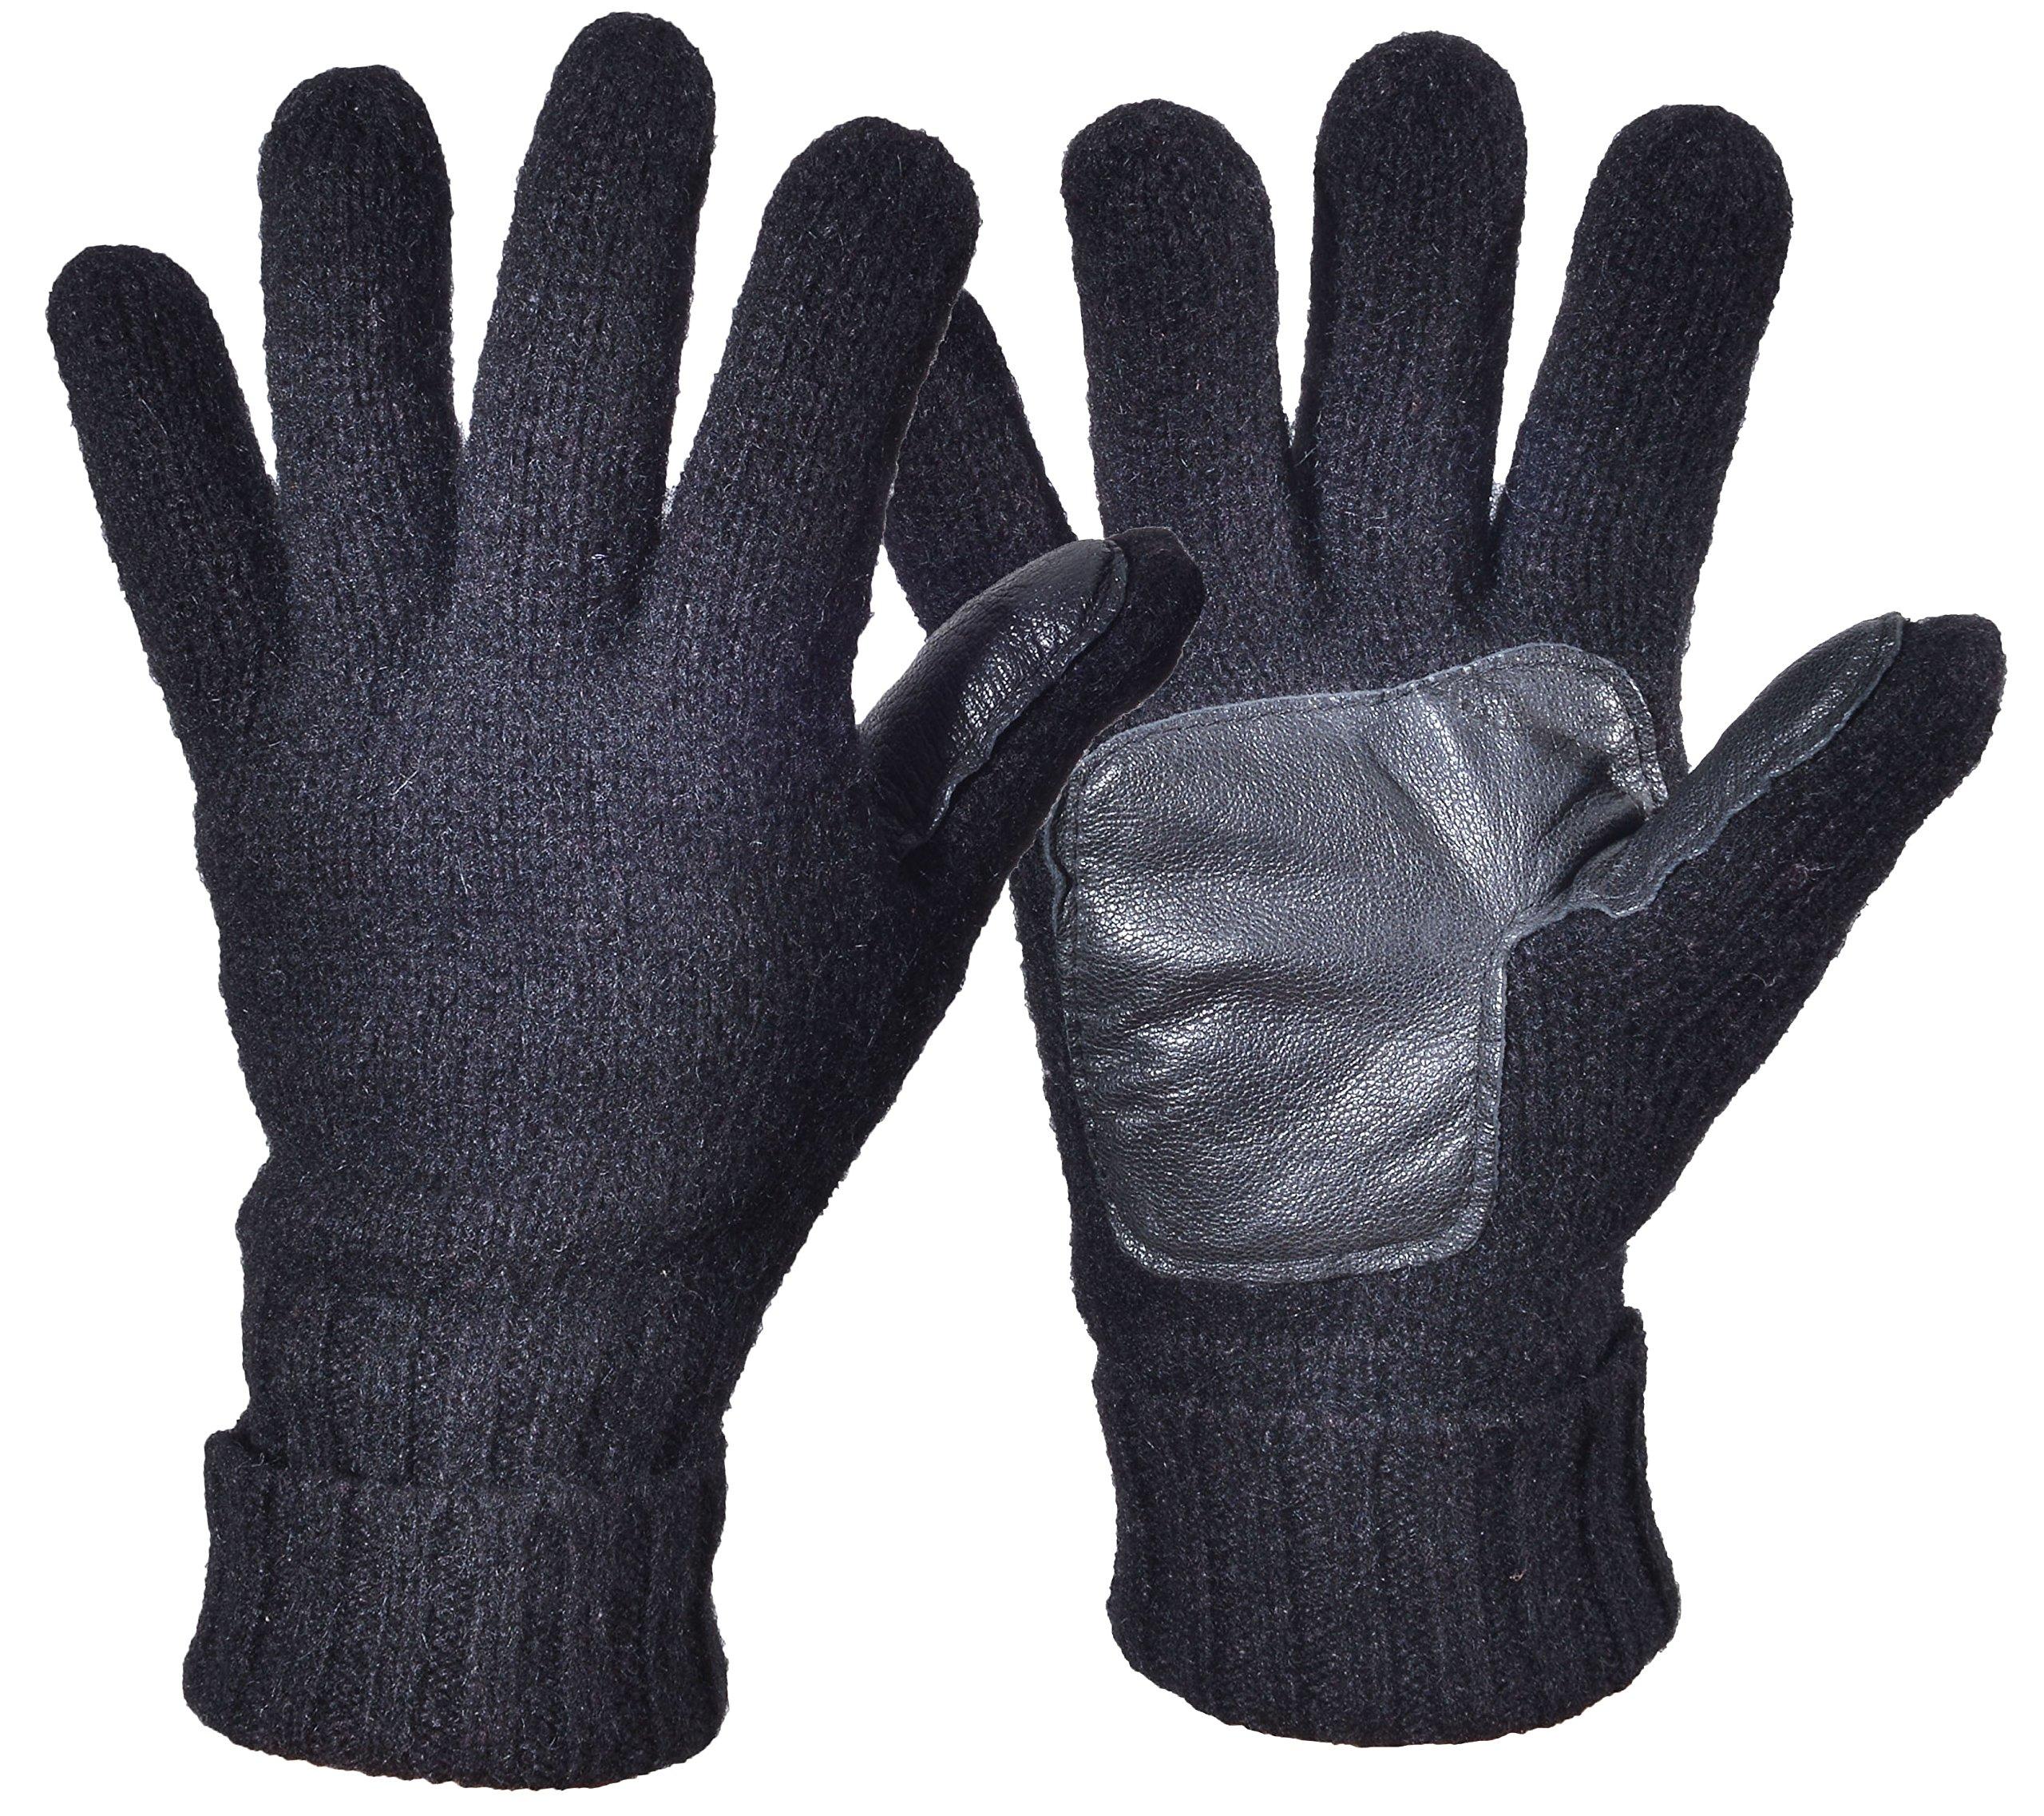 Woogwin Men's Winter Wool Knit Gloves Thick Fleece Lined Warm Non Slip Gloves (Black) by Woogwin (Image #1)